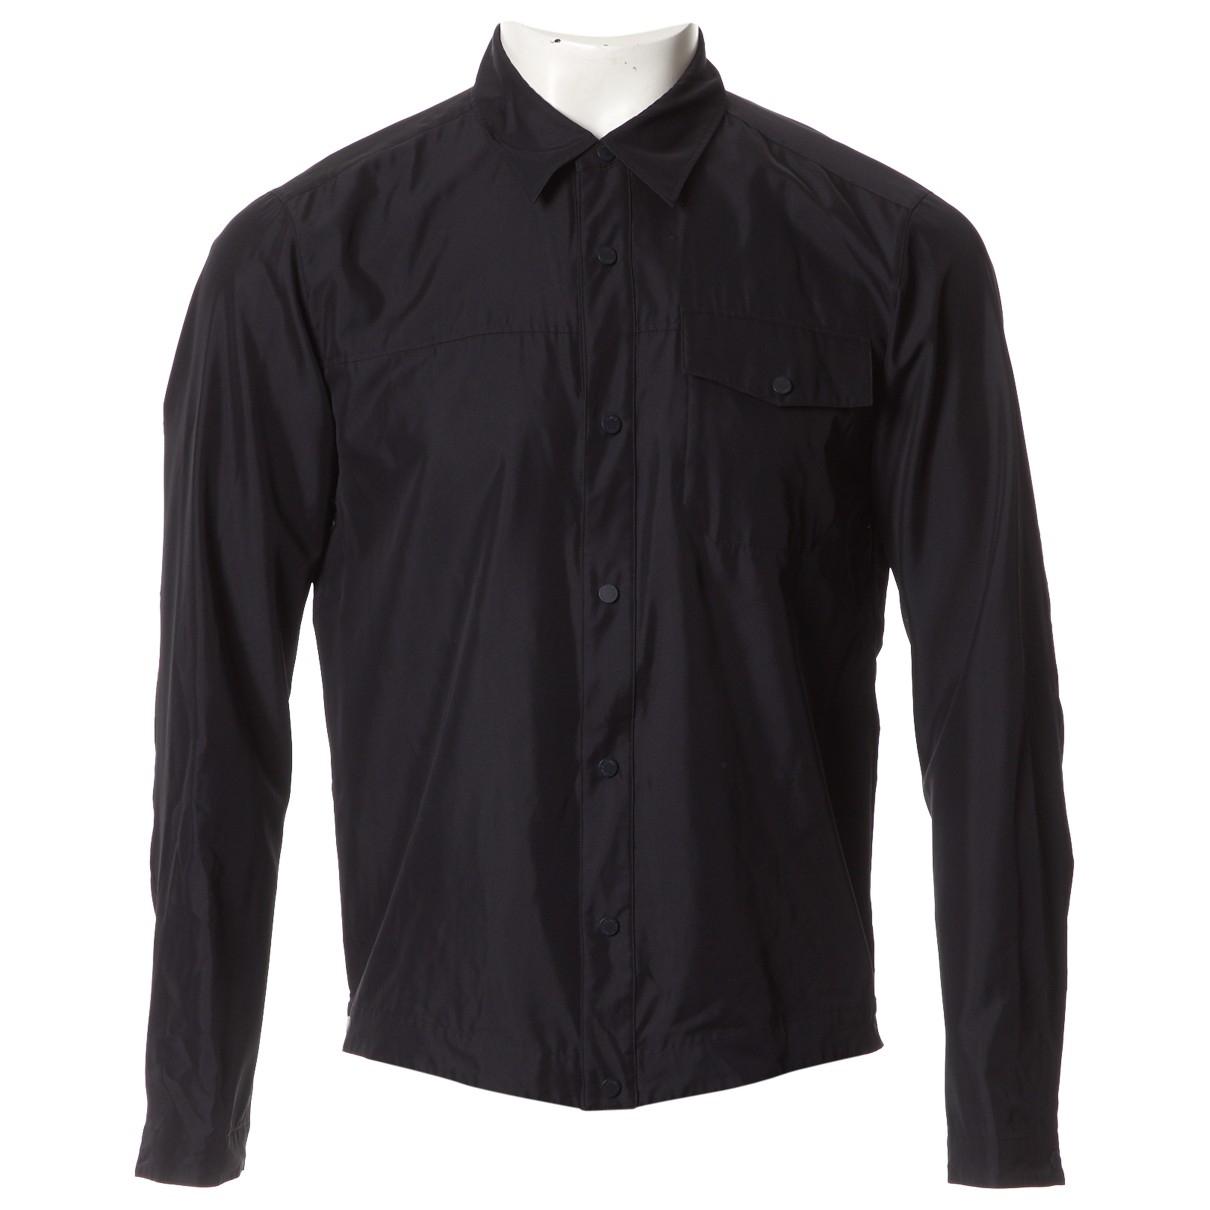 Louis Vuitton \N Black jacket  for Men M International